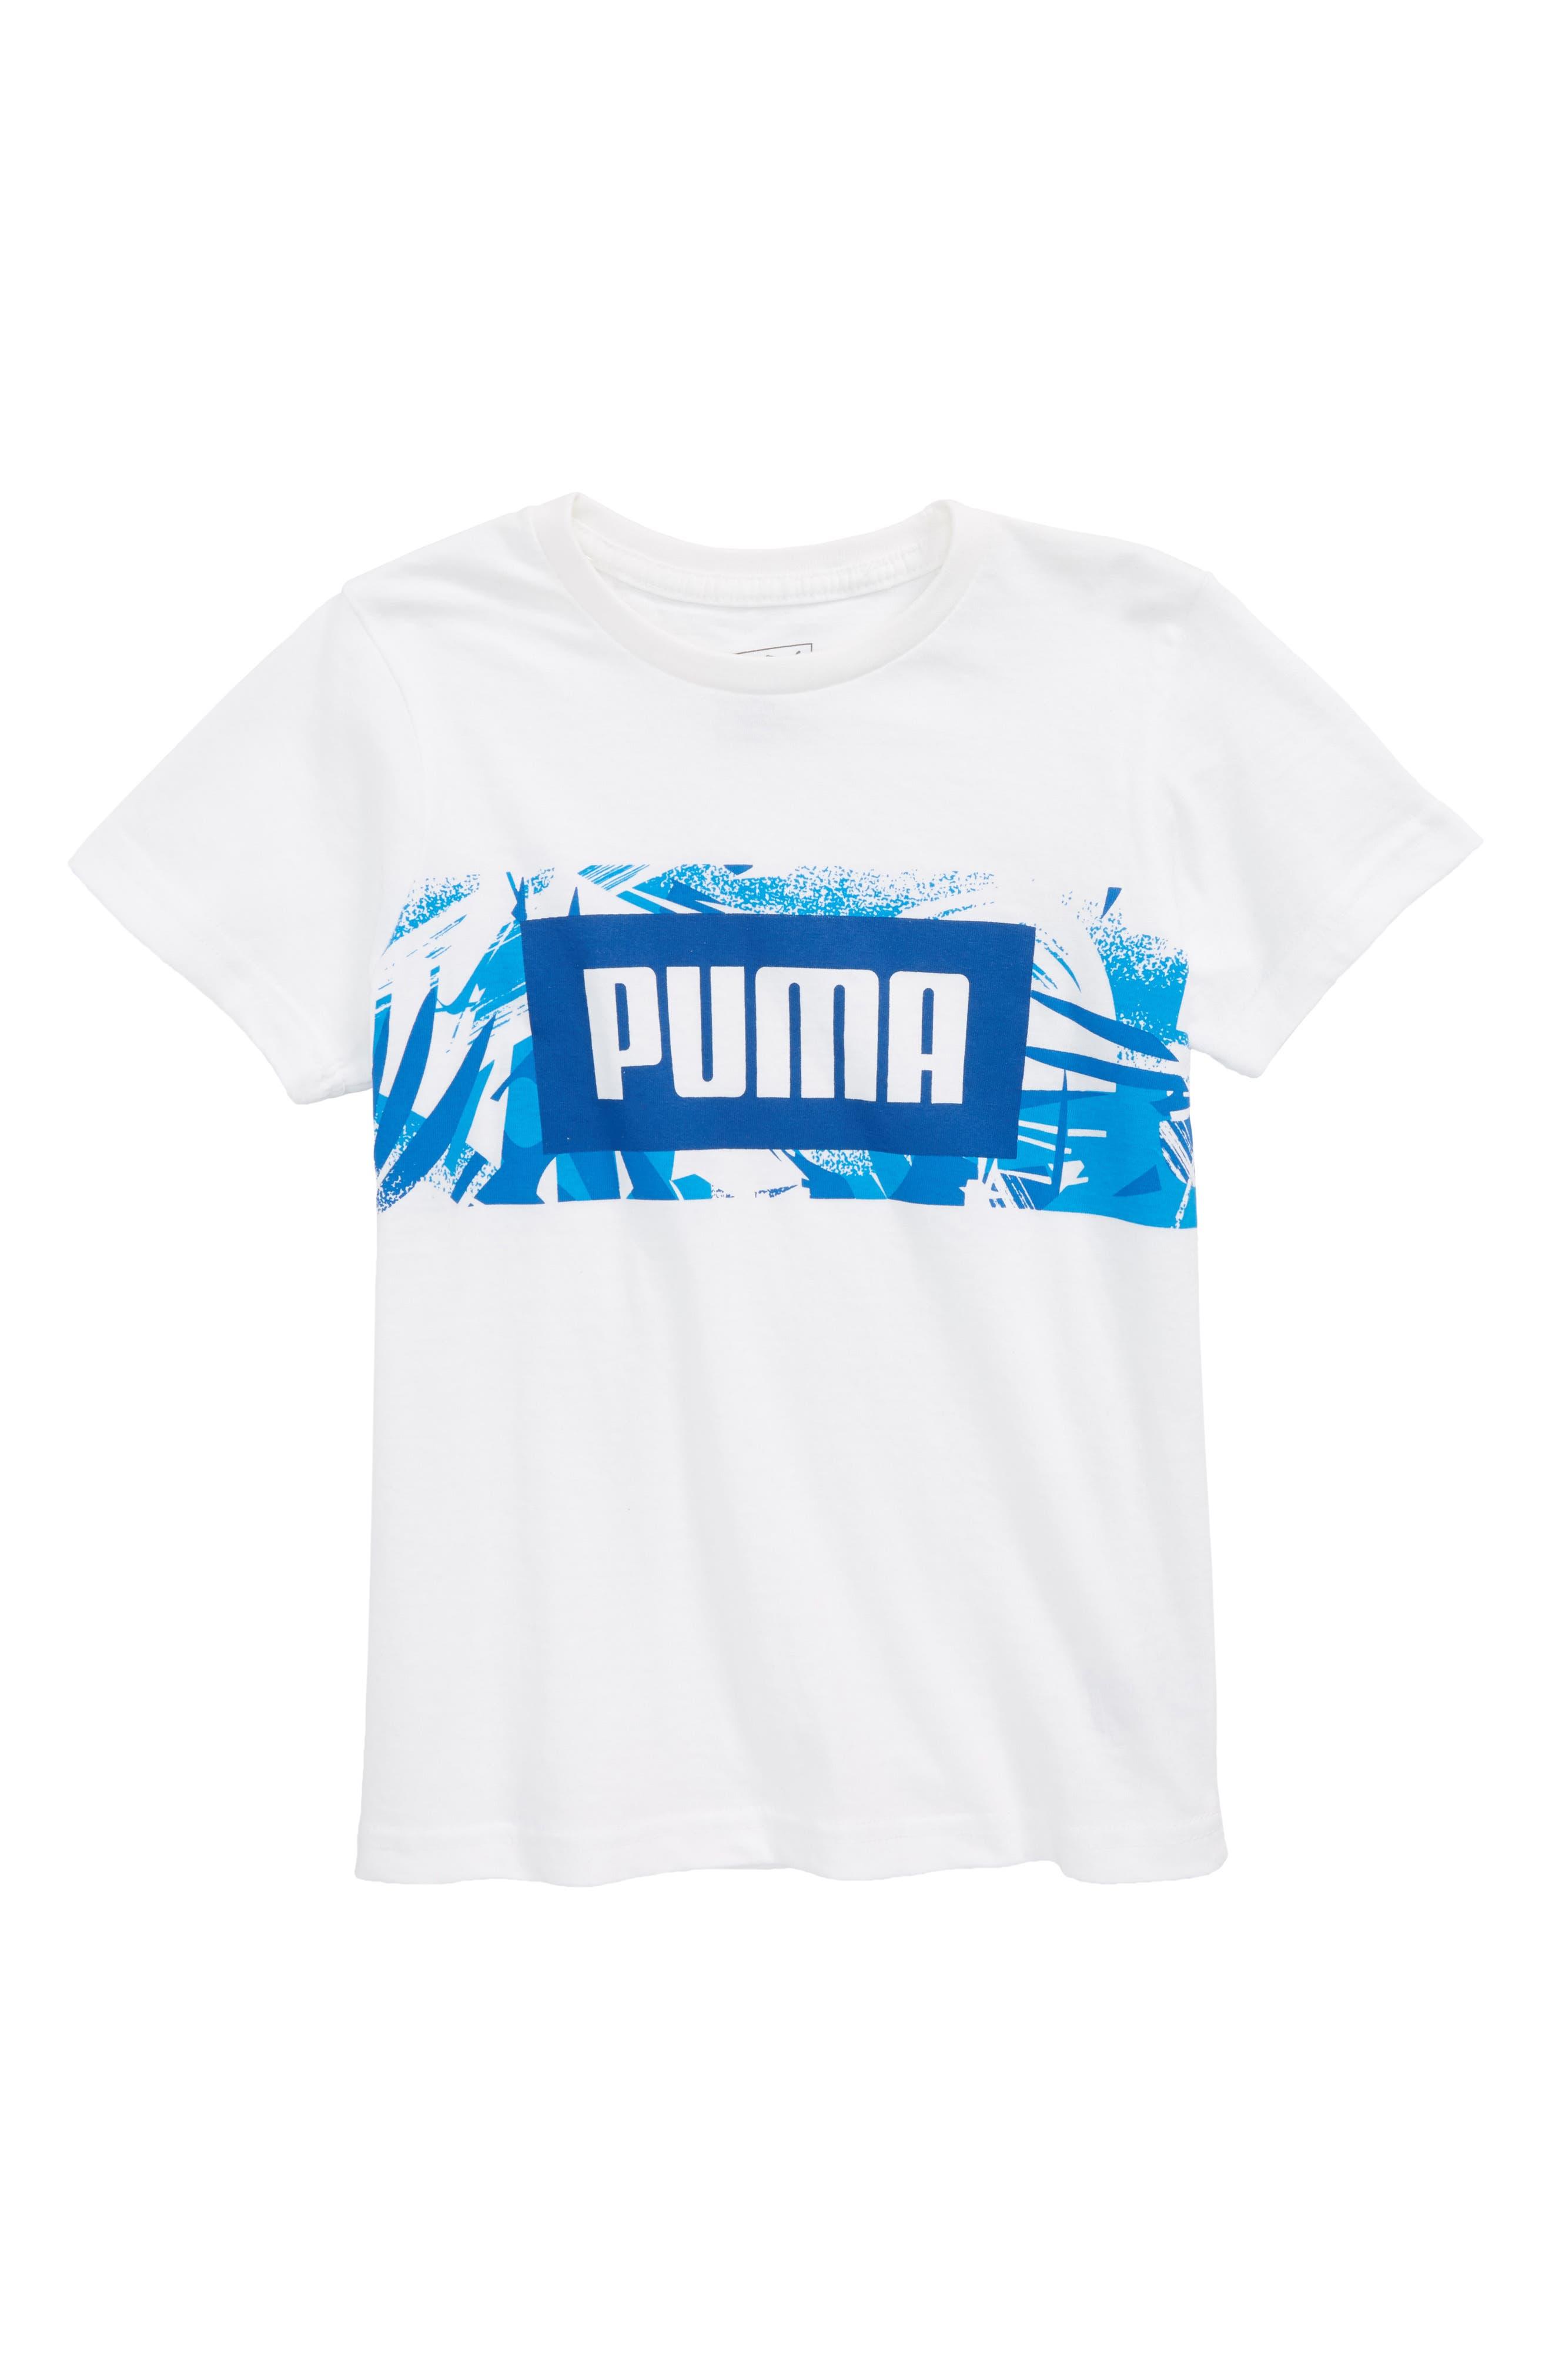 PUMA Graphic T-Shirt, Main, color, 100